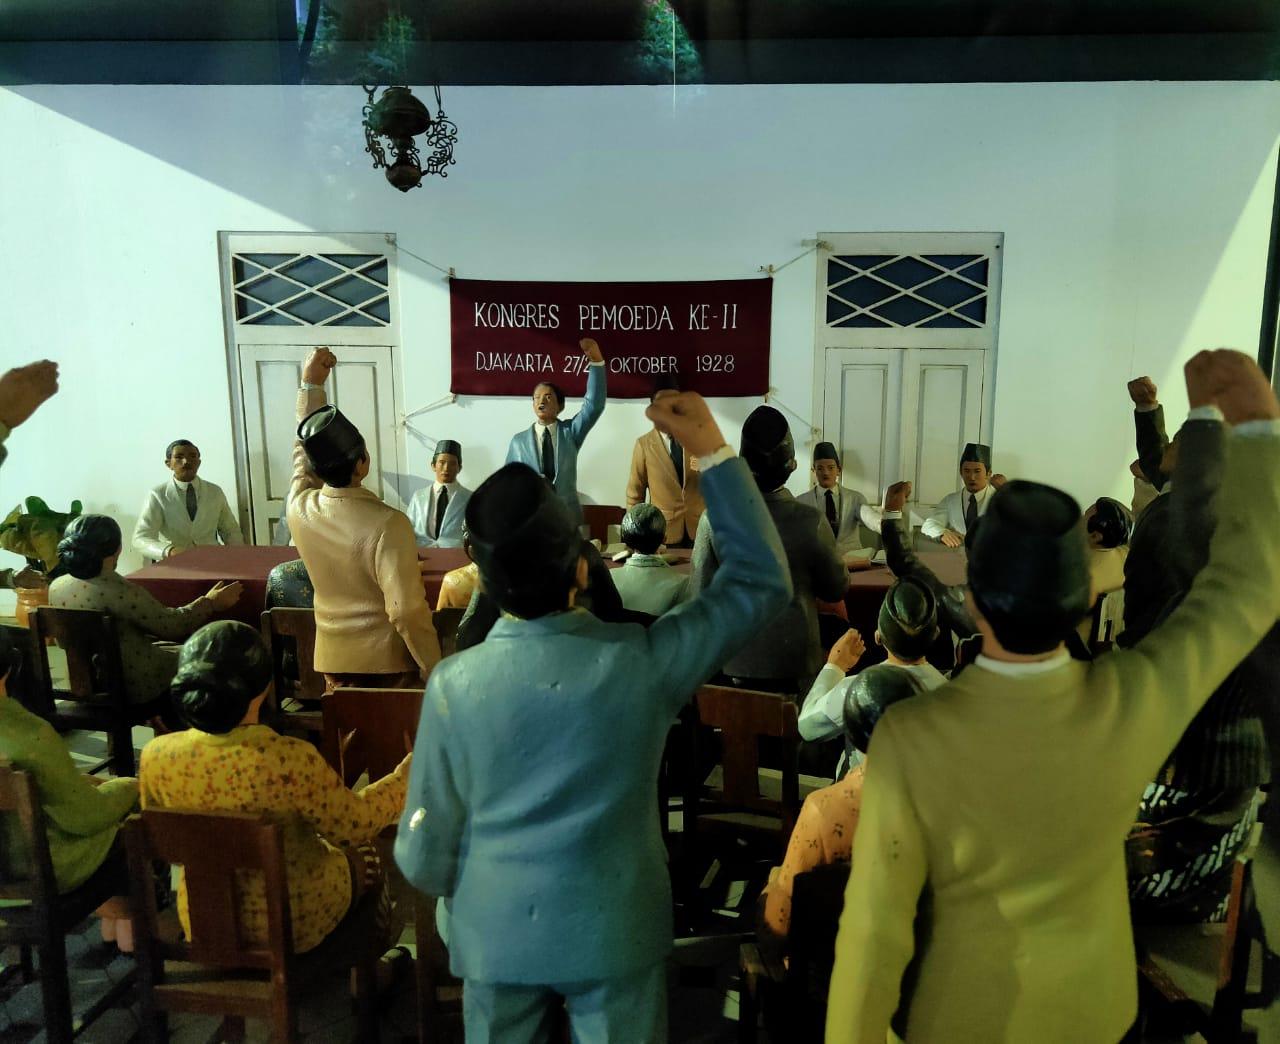 Ruang Kongres Sumpah Pemuda 91 Tahun Sumpah Pemuda Museum Sumpah Pemuda